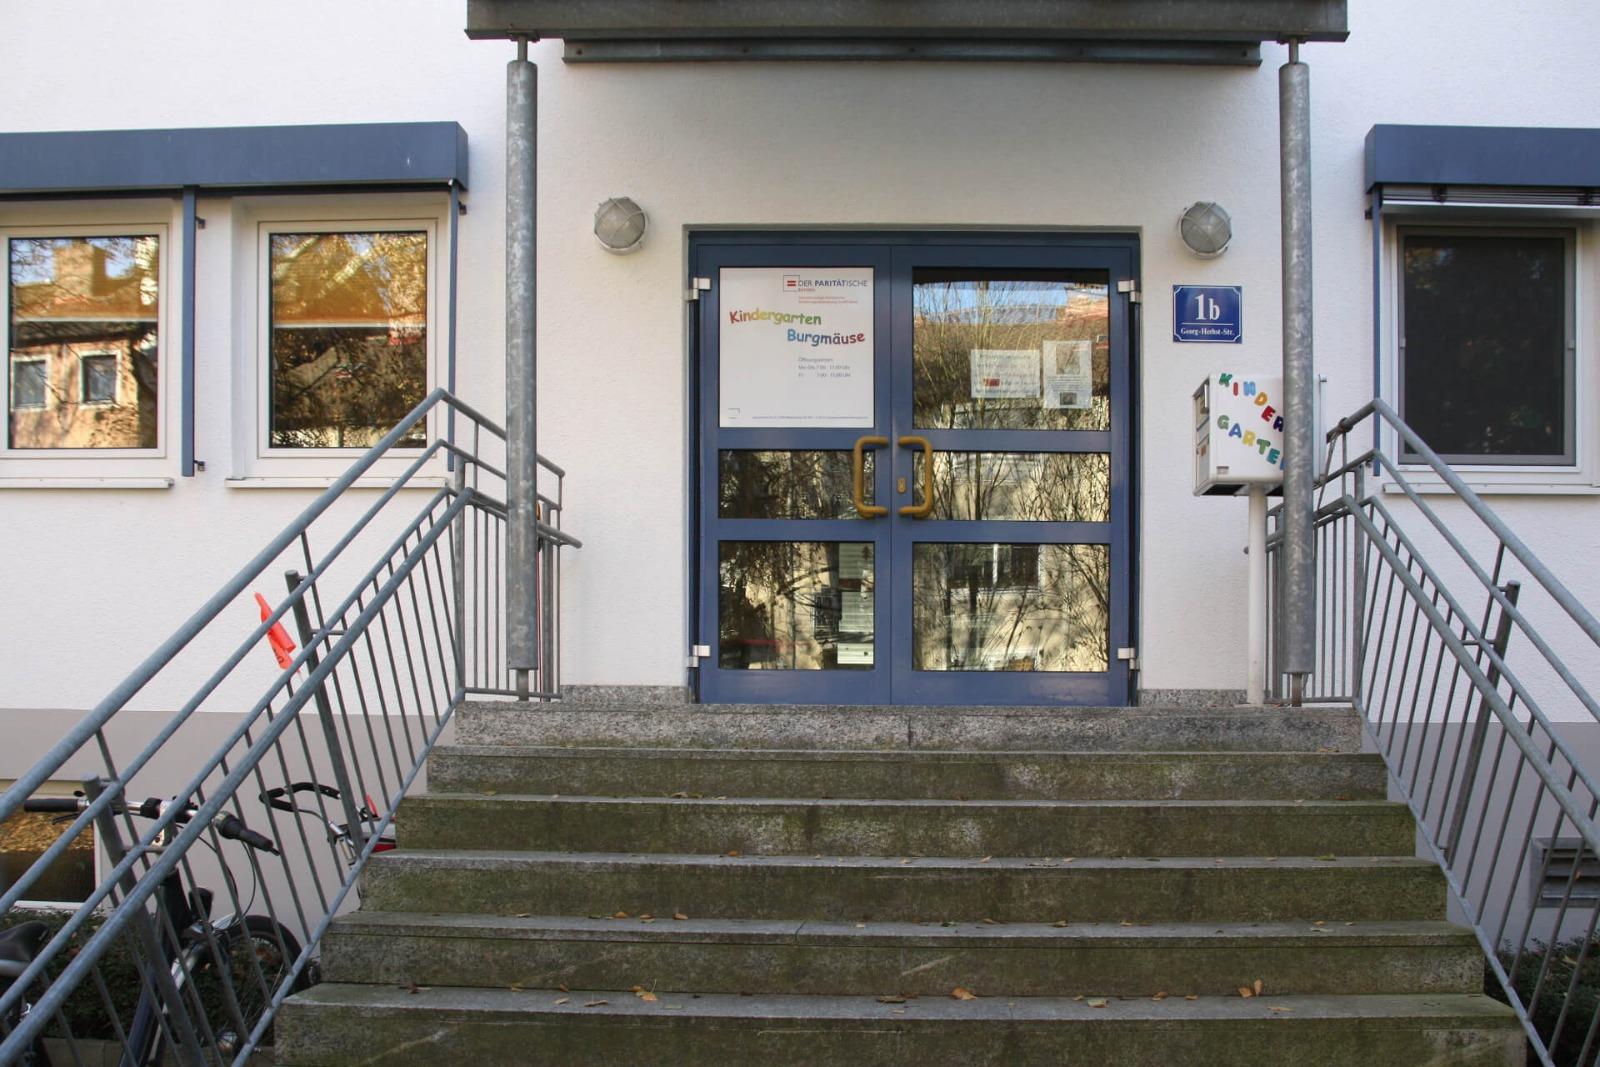 kindergarten burgm use 93049 regensburg parit tische kita